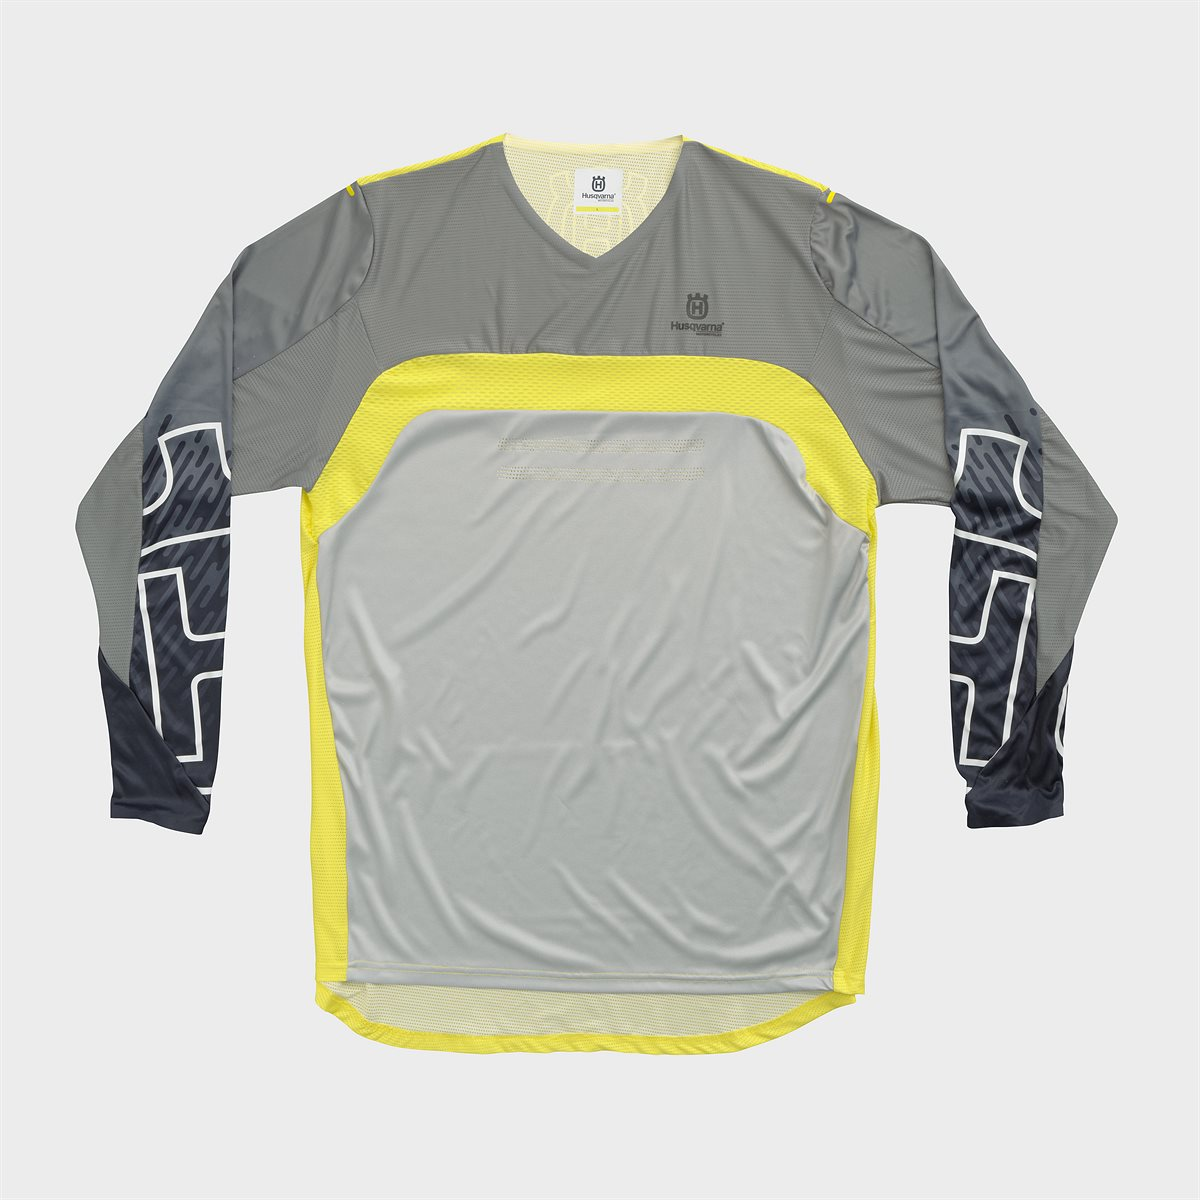 Railed Shirt Pro (4)